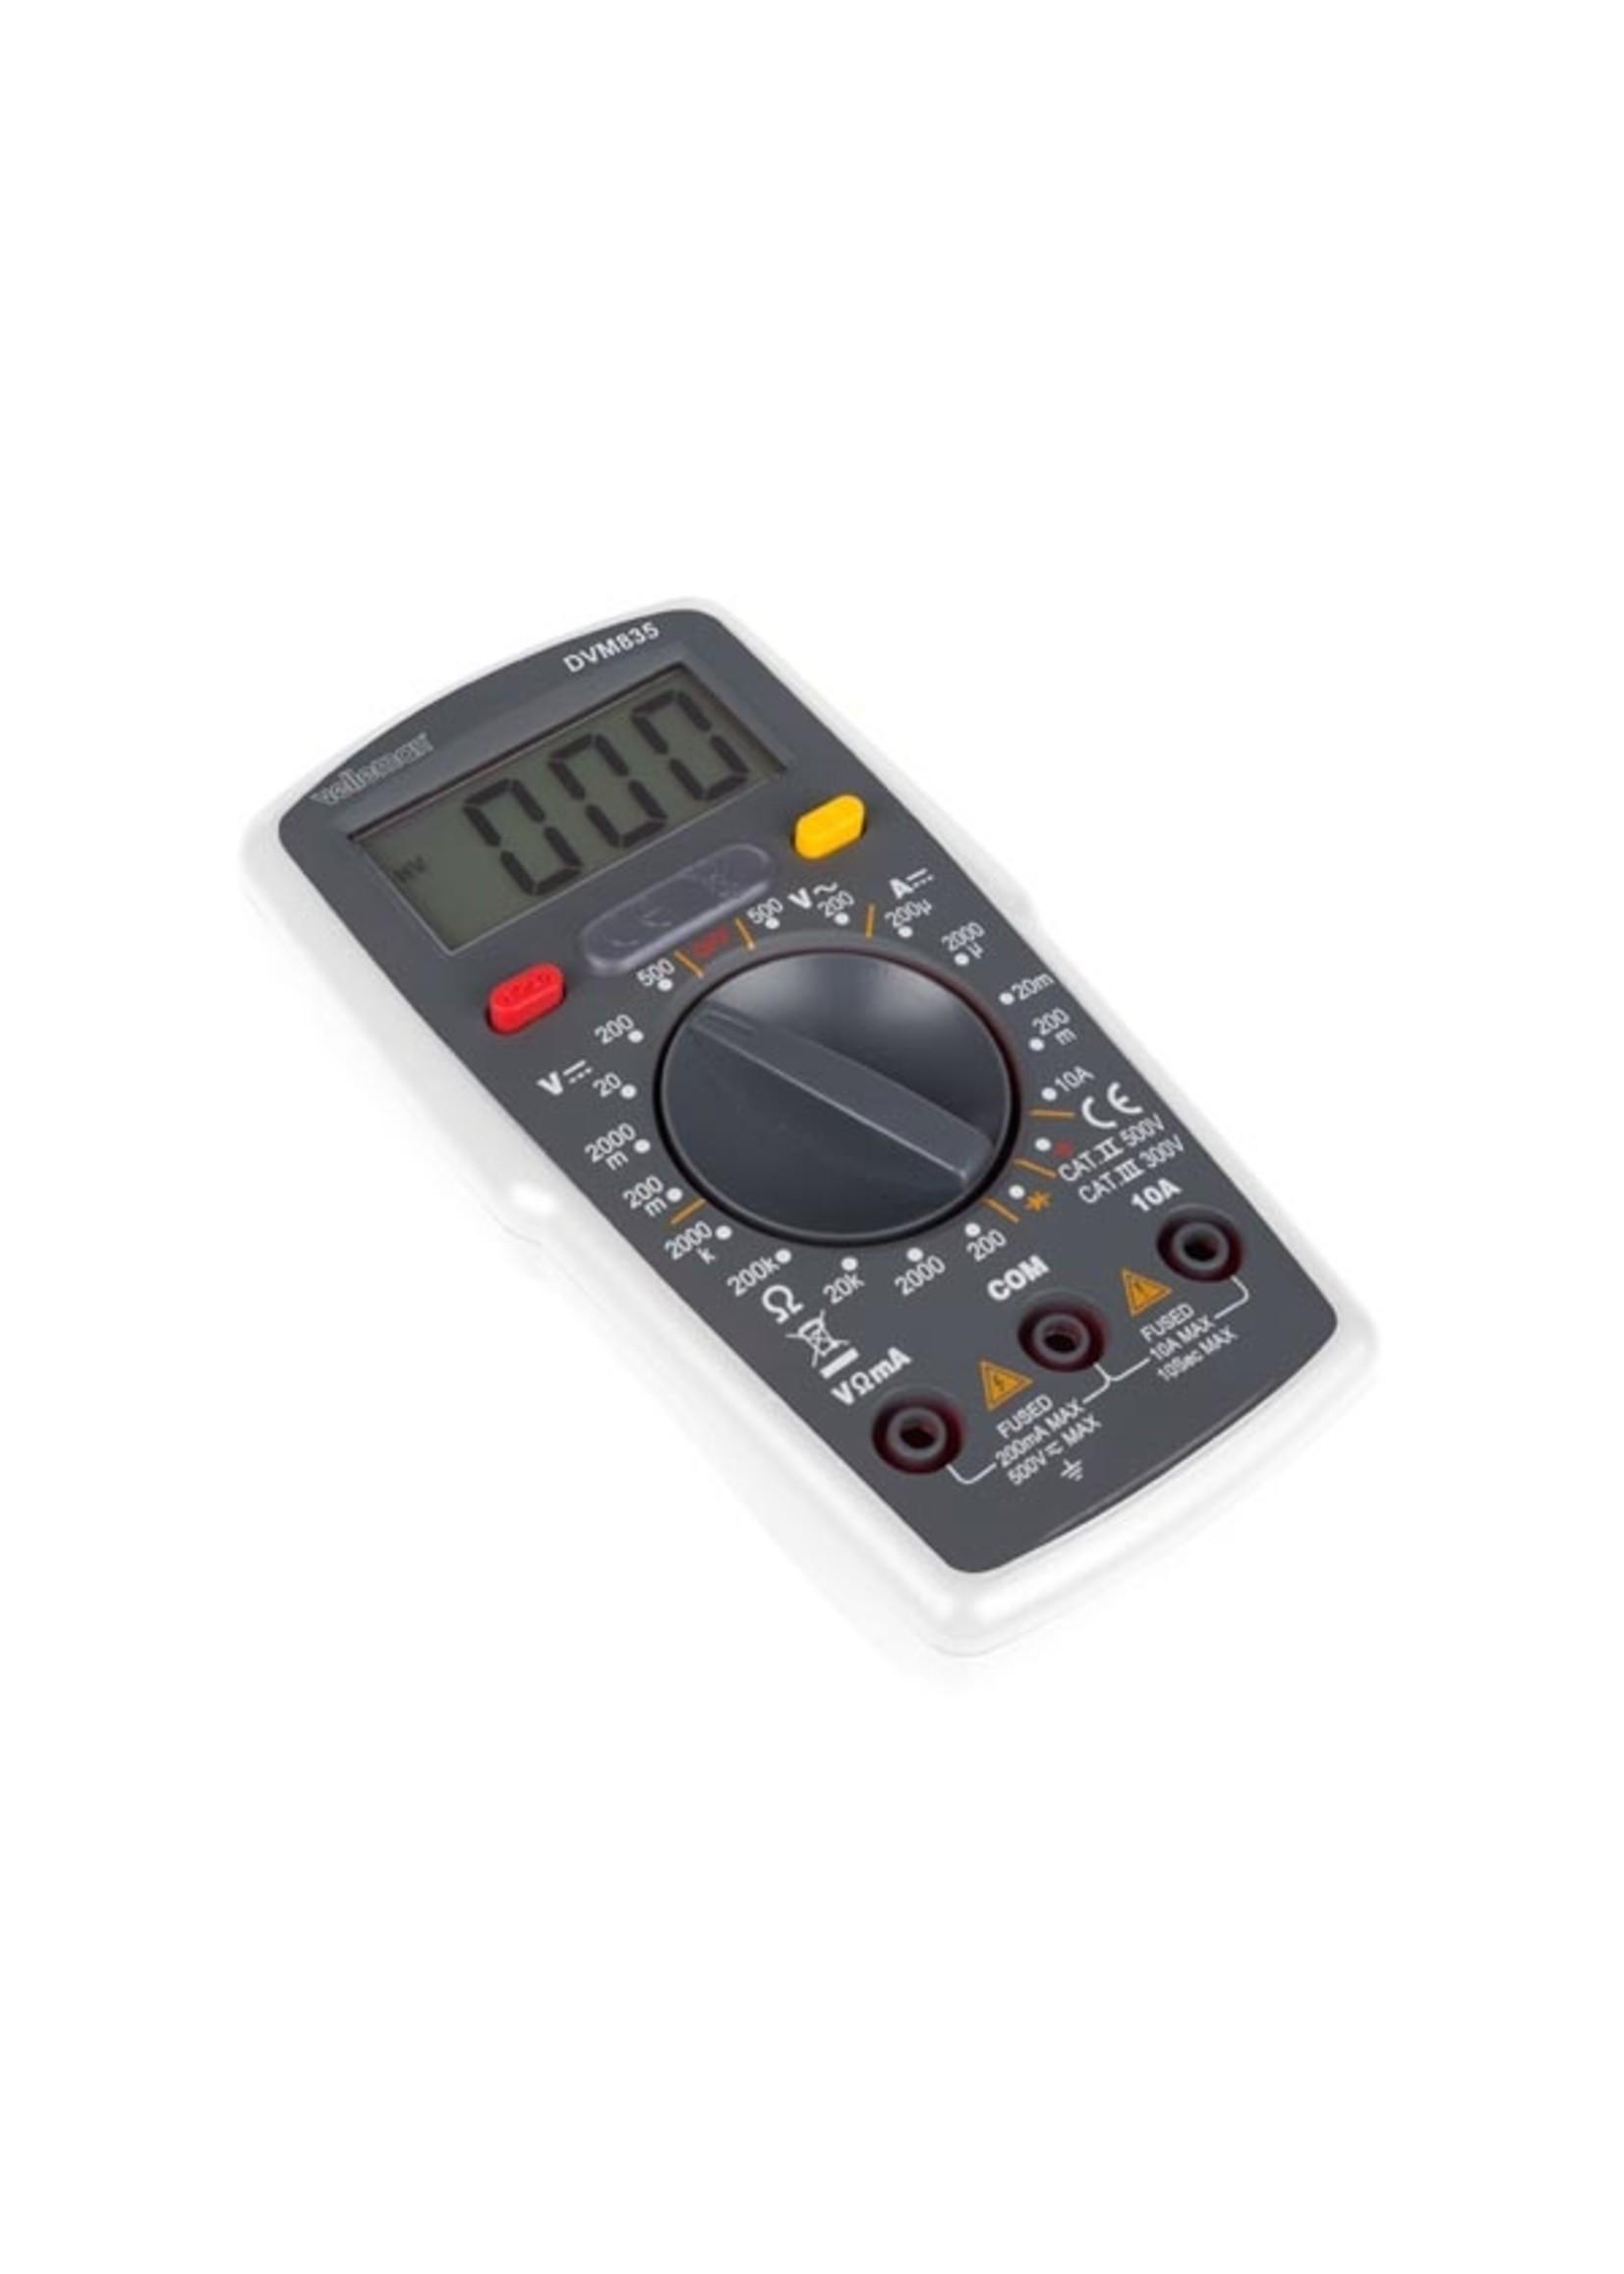 Toolland Digitale Multimeter - Cat. II 500 V / Cat. III 300 V - 10 A - 1999 Counts